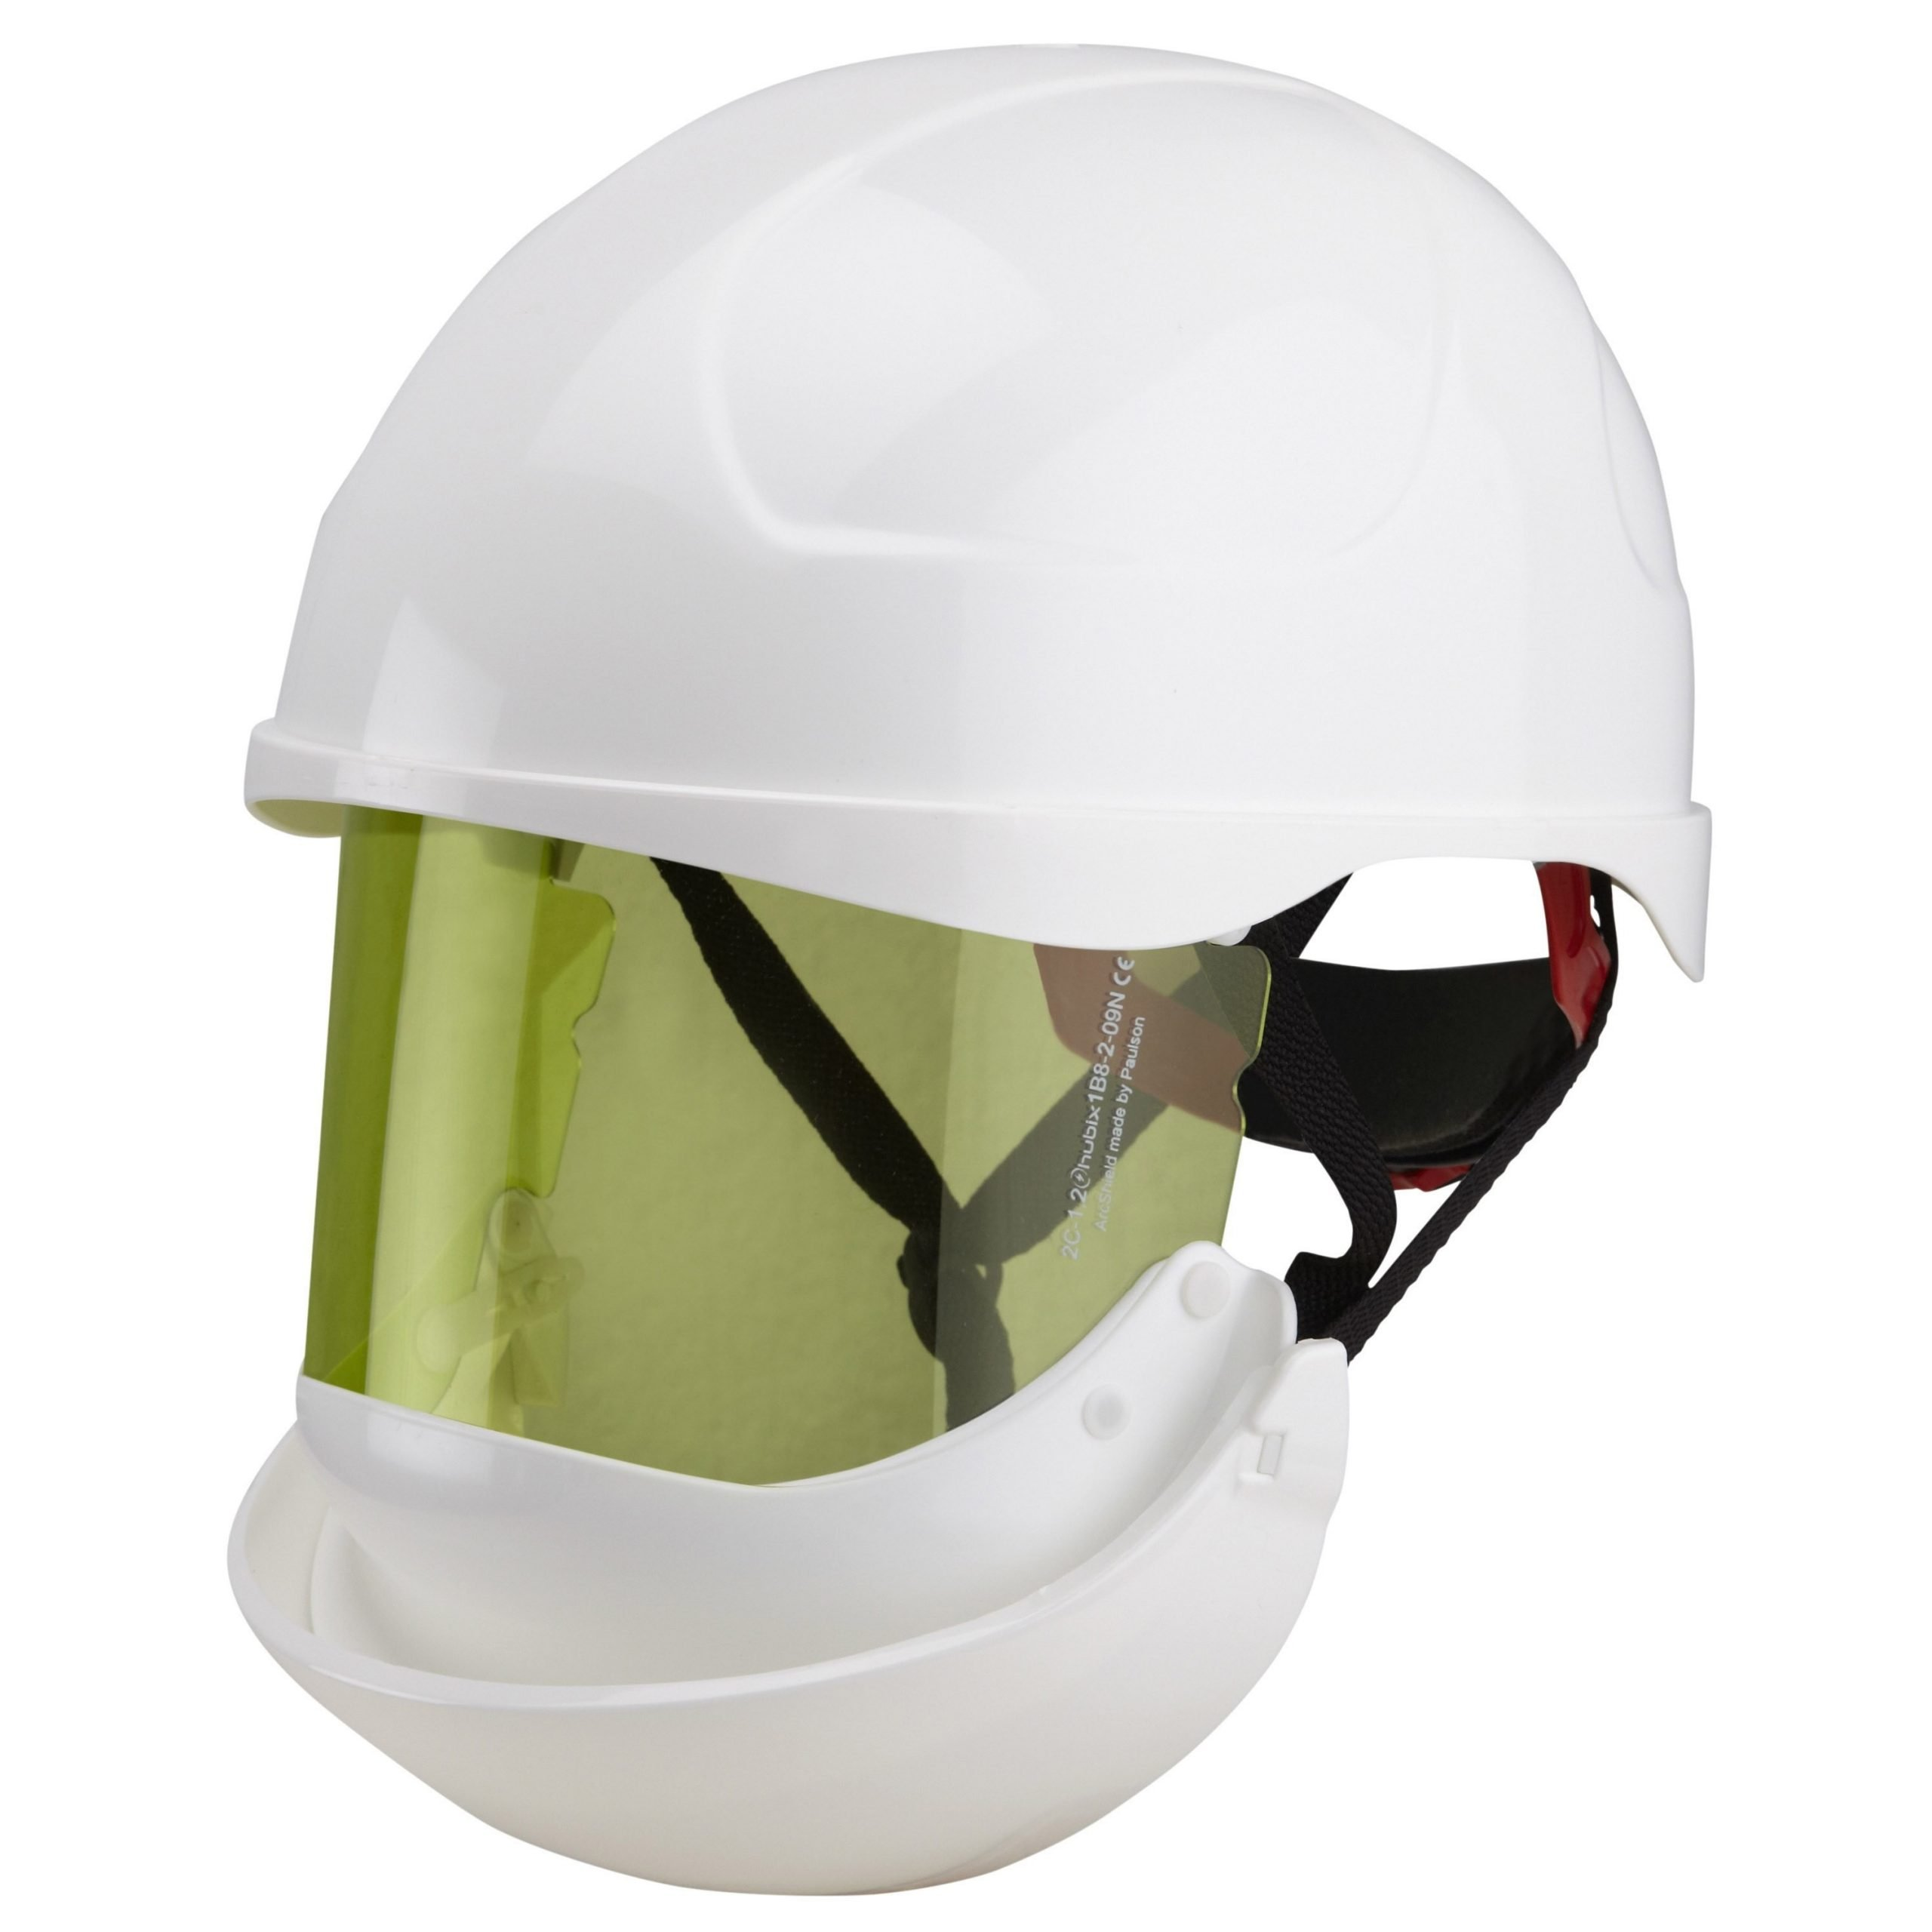 ProGARM 2680 Helmet